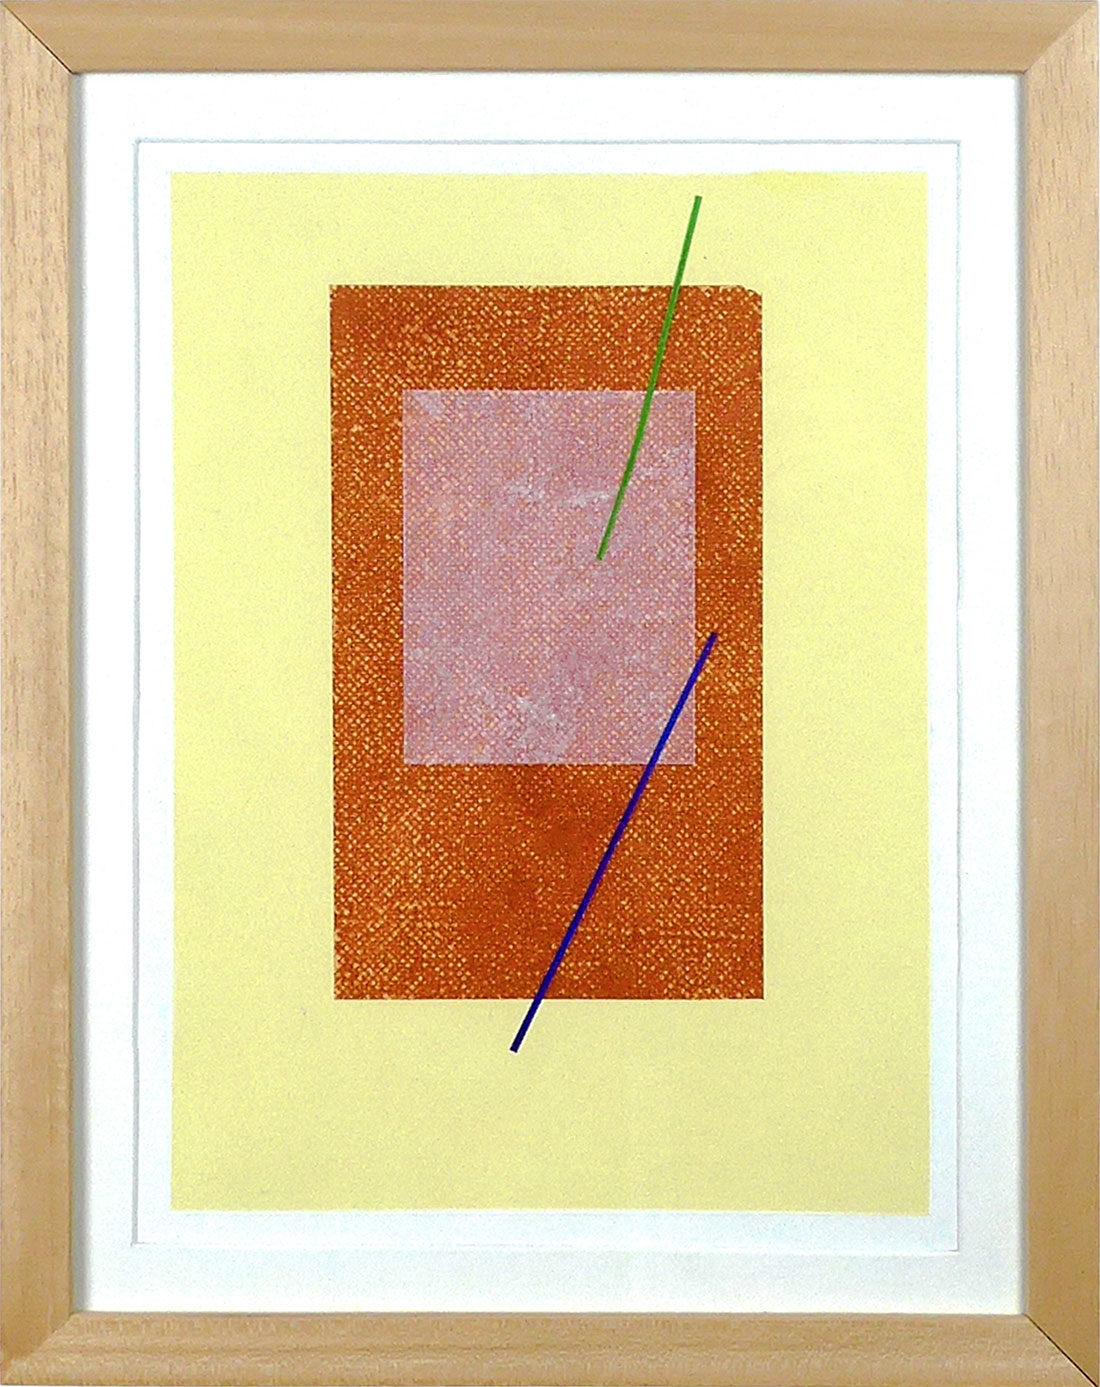 Carlos Stoffel - Tableau - Jaune rectangle orange